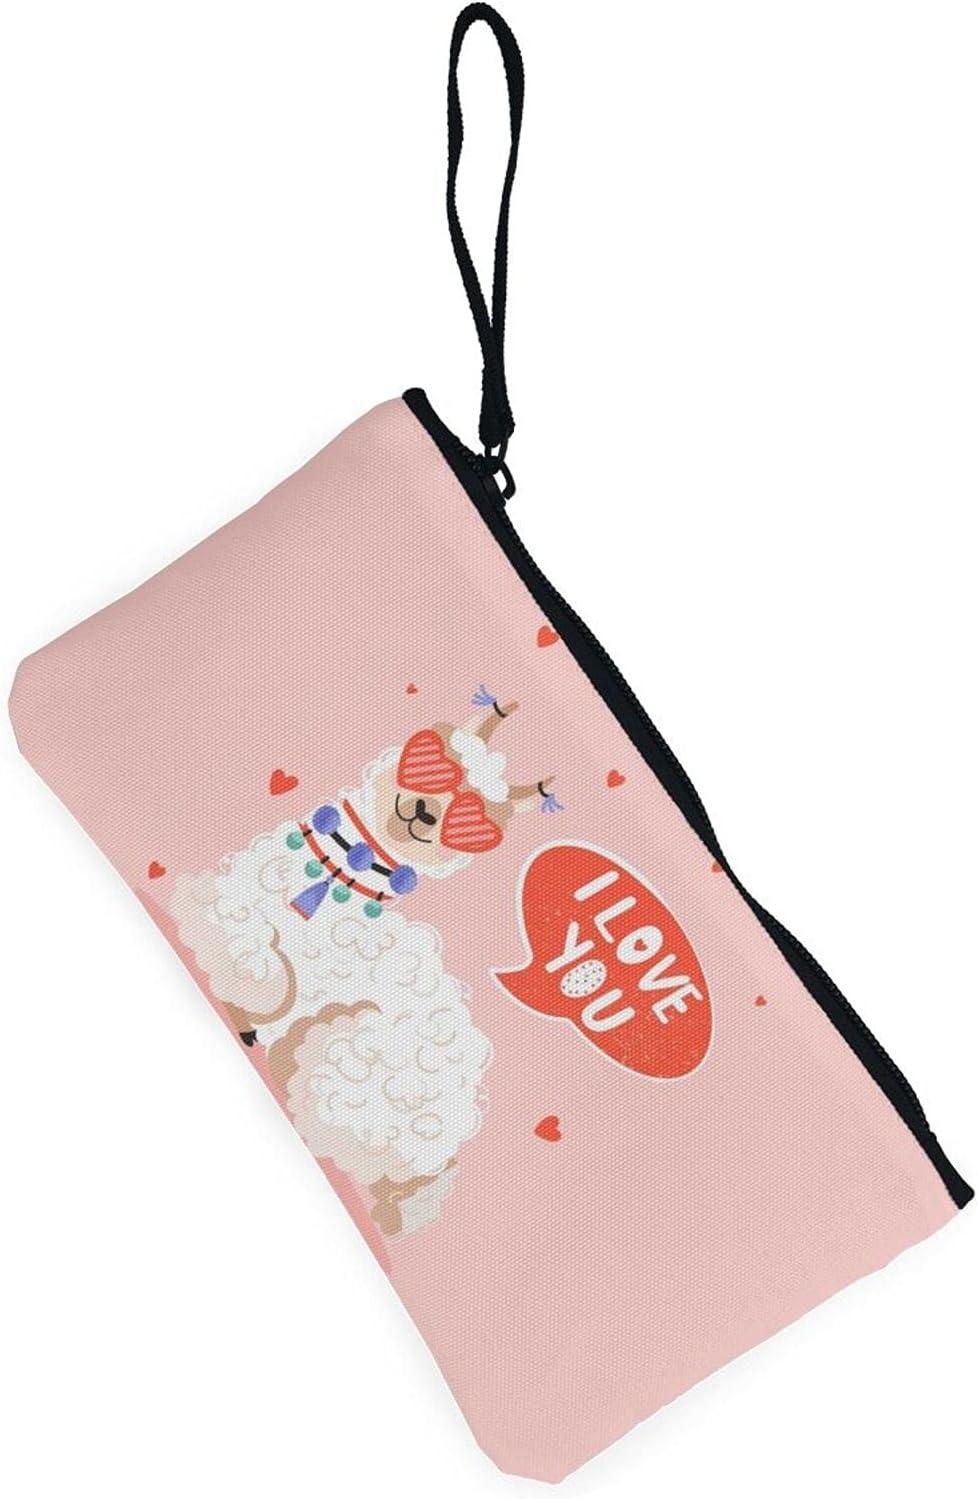 AORRUAM Cartoon Alpaca Heart Canvas Coin Purse,Canvas Zipper Pencil Cases,Canvas Change Purse Pouch Mini Wallet Coin Bag